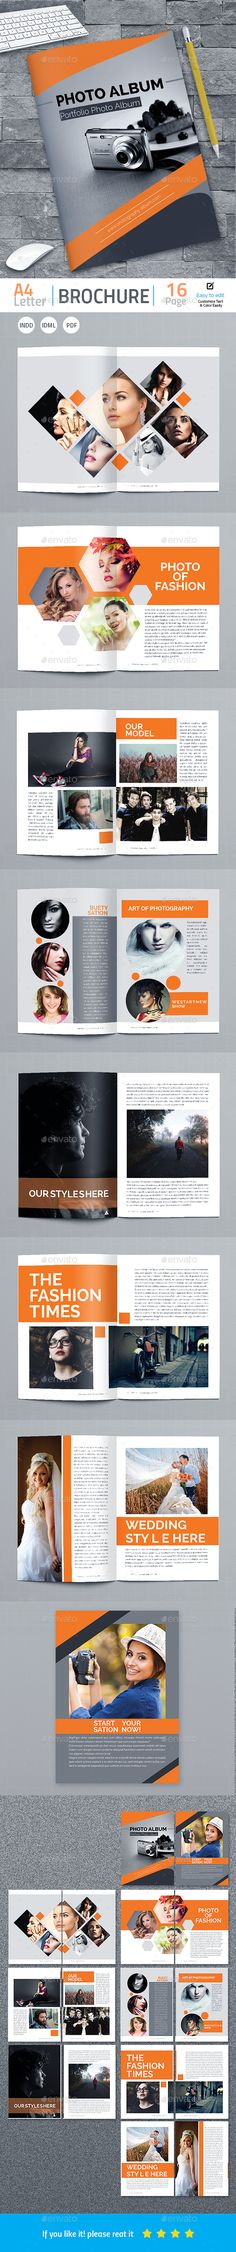 Photography Portfolio Album - Photo Albums Print Templates Download here: https://graphicriver.net/item/photography-portfolio-album/19931981?ref=classicdesignp